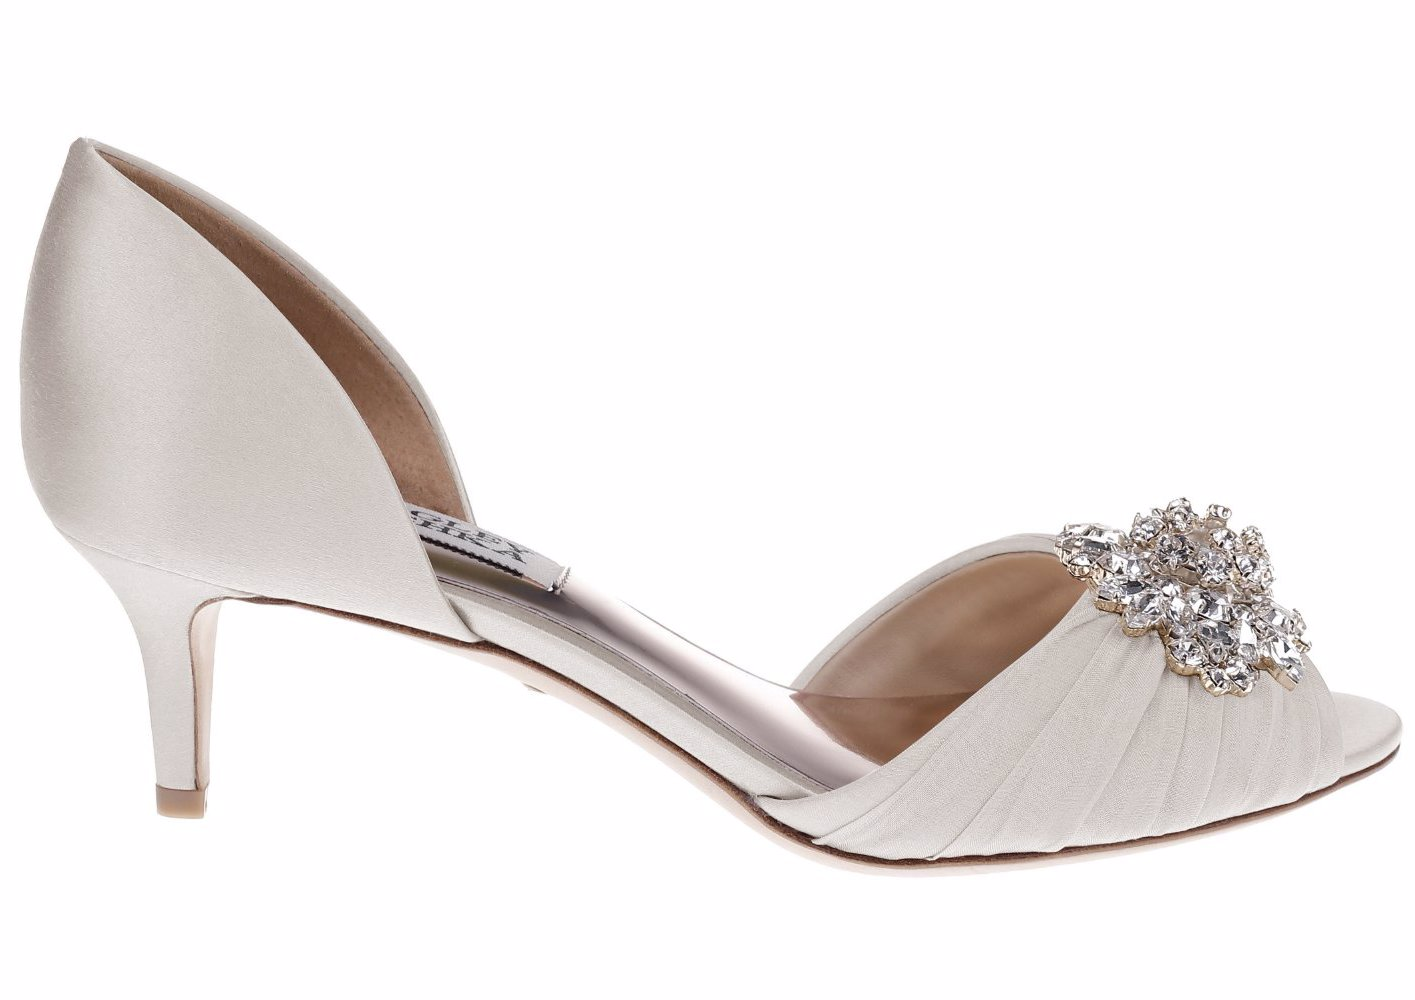 0299a994d9 NZSALE | Badgley Mischka Sabine Satin Low Heel Peep Toe Ivory